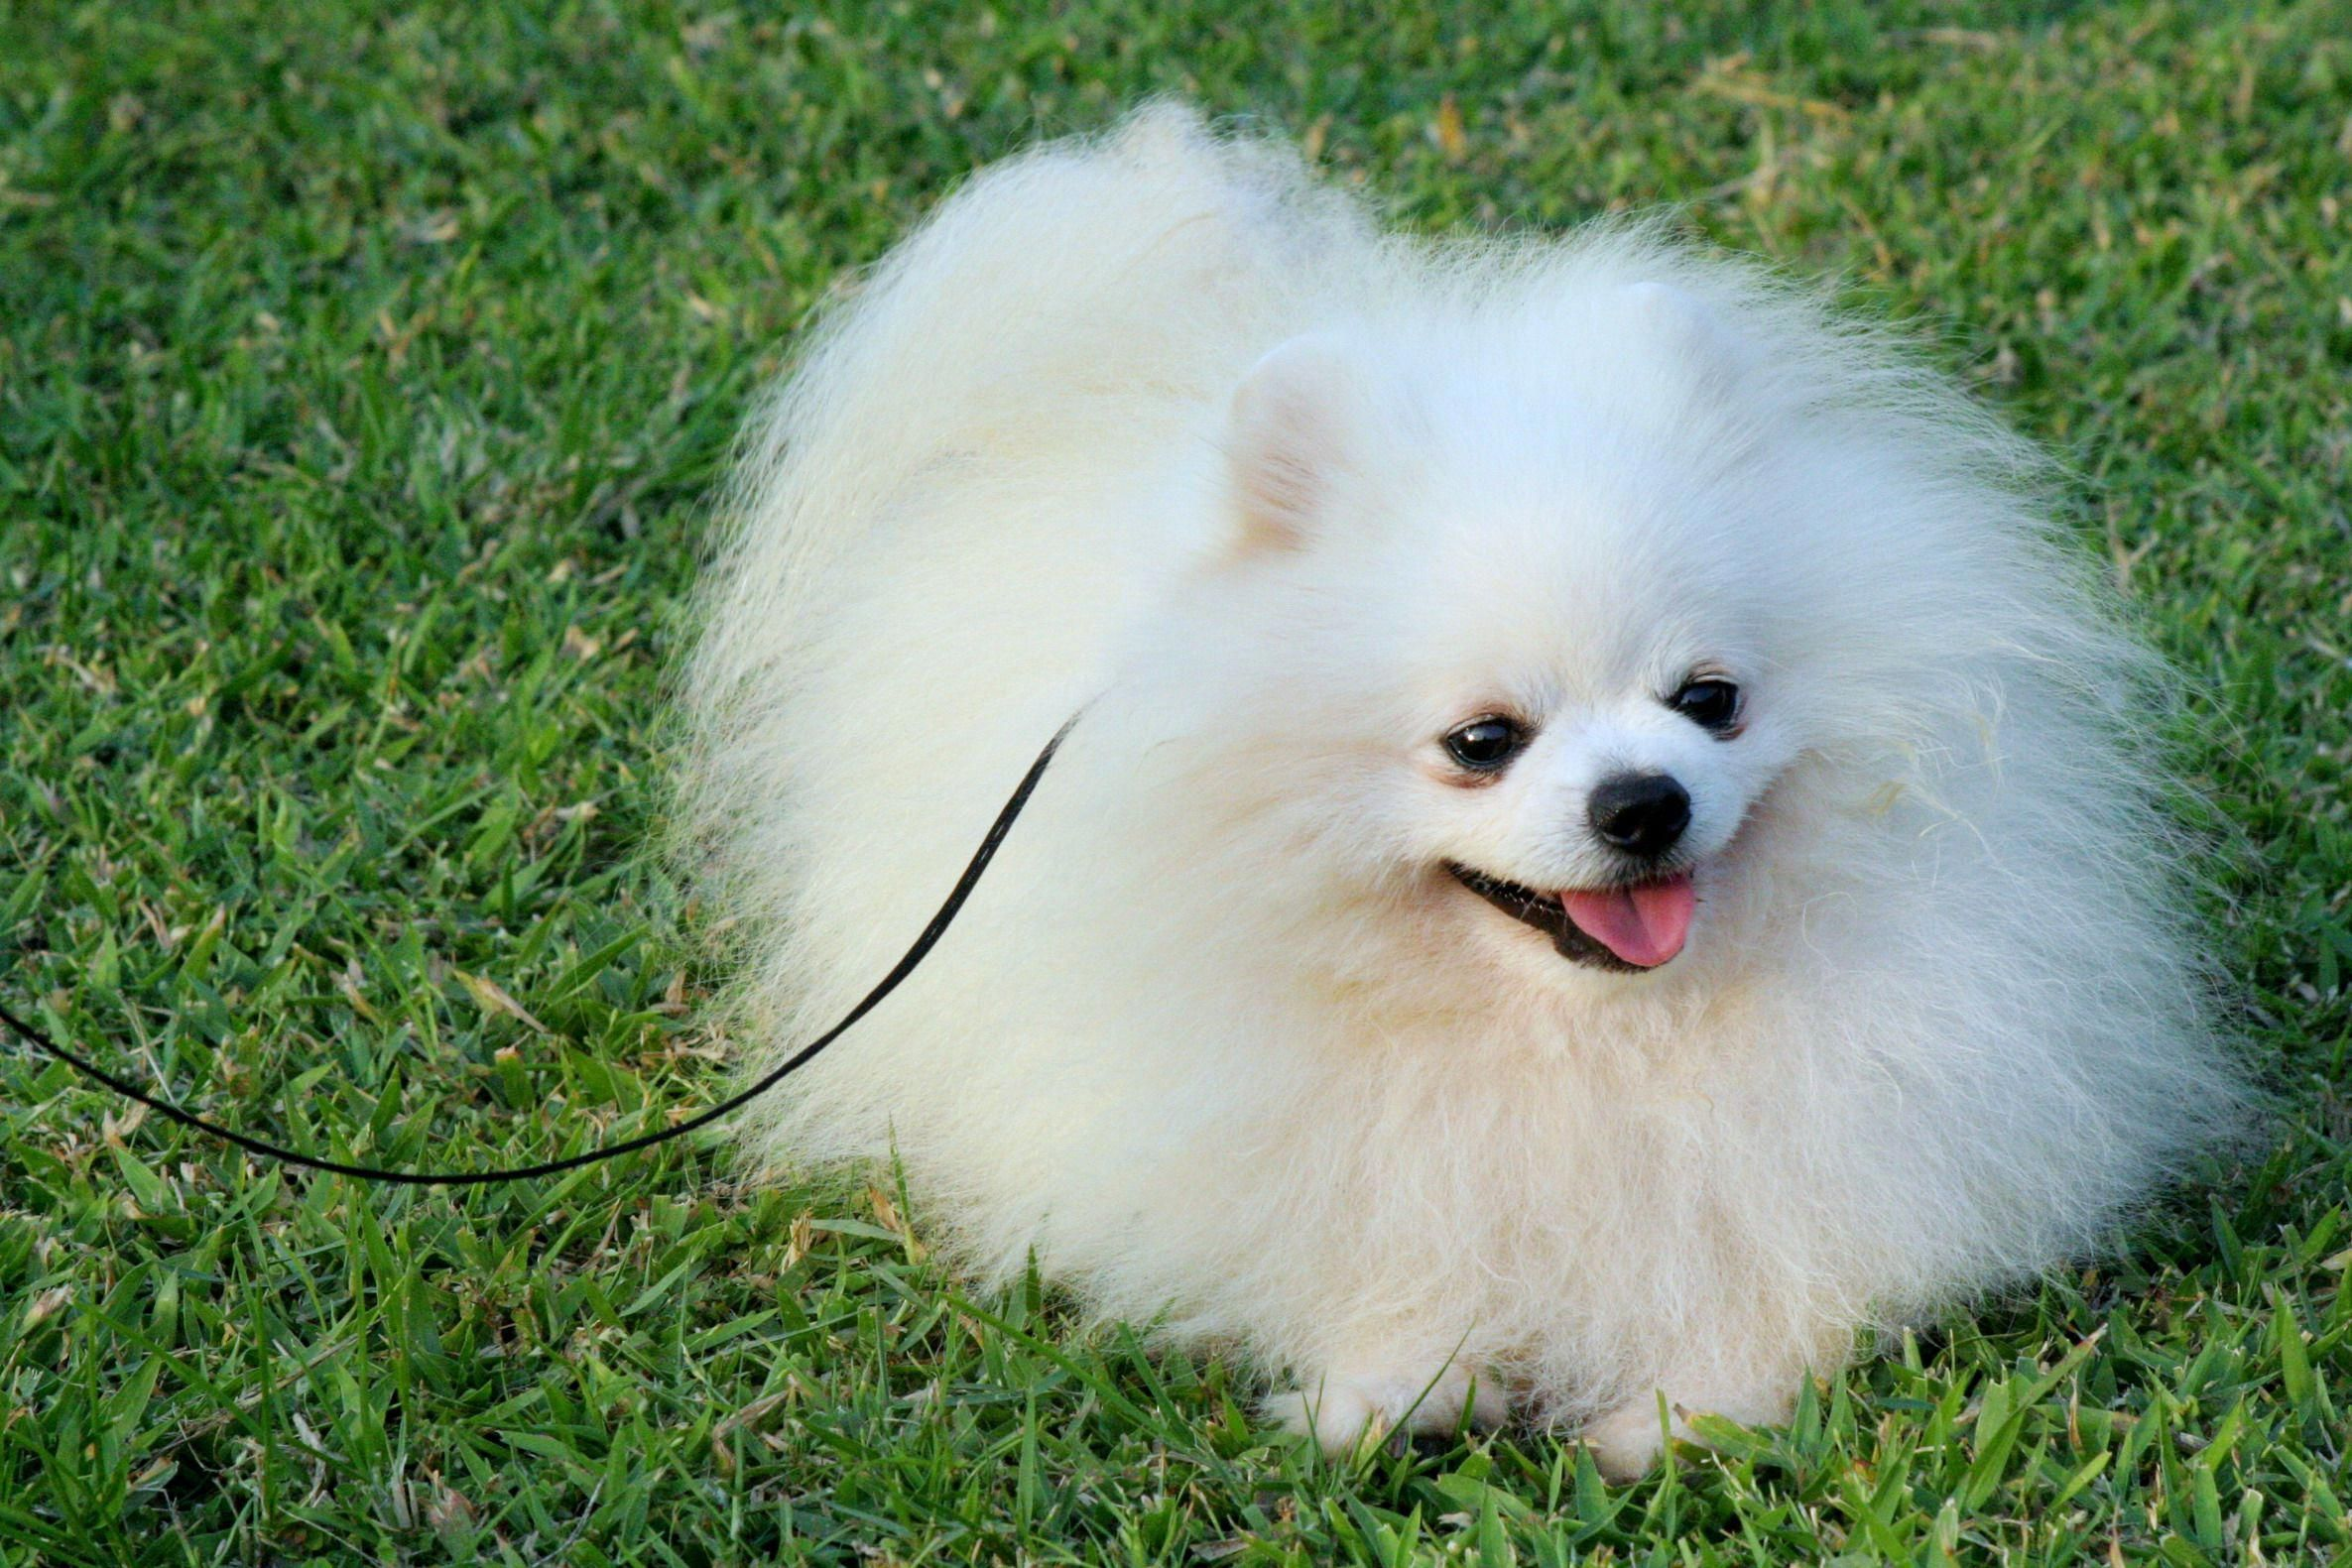 Pomeranian Puppies White Pomeranian Male Age Of 2 Years Old Pomeranian Dog Dog Breeds Pomeranian Puppy